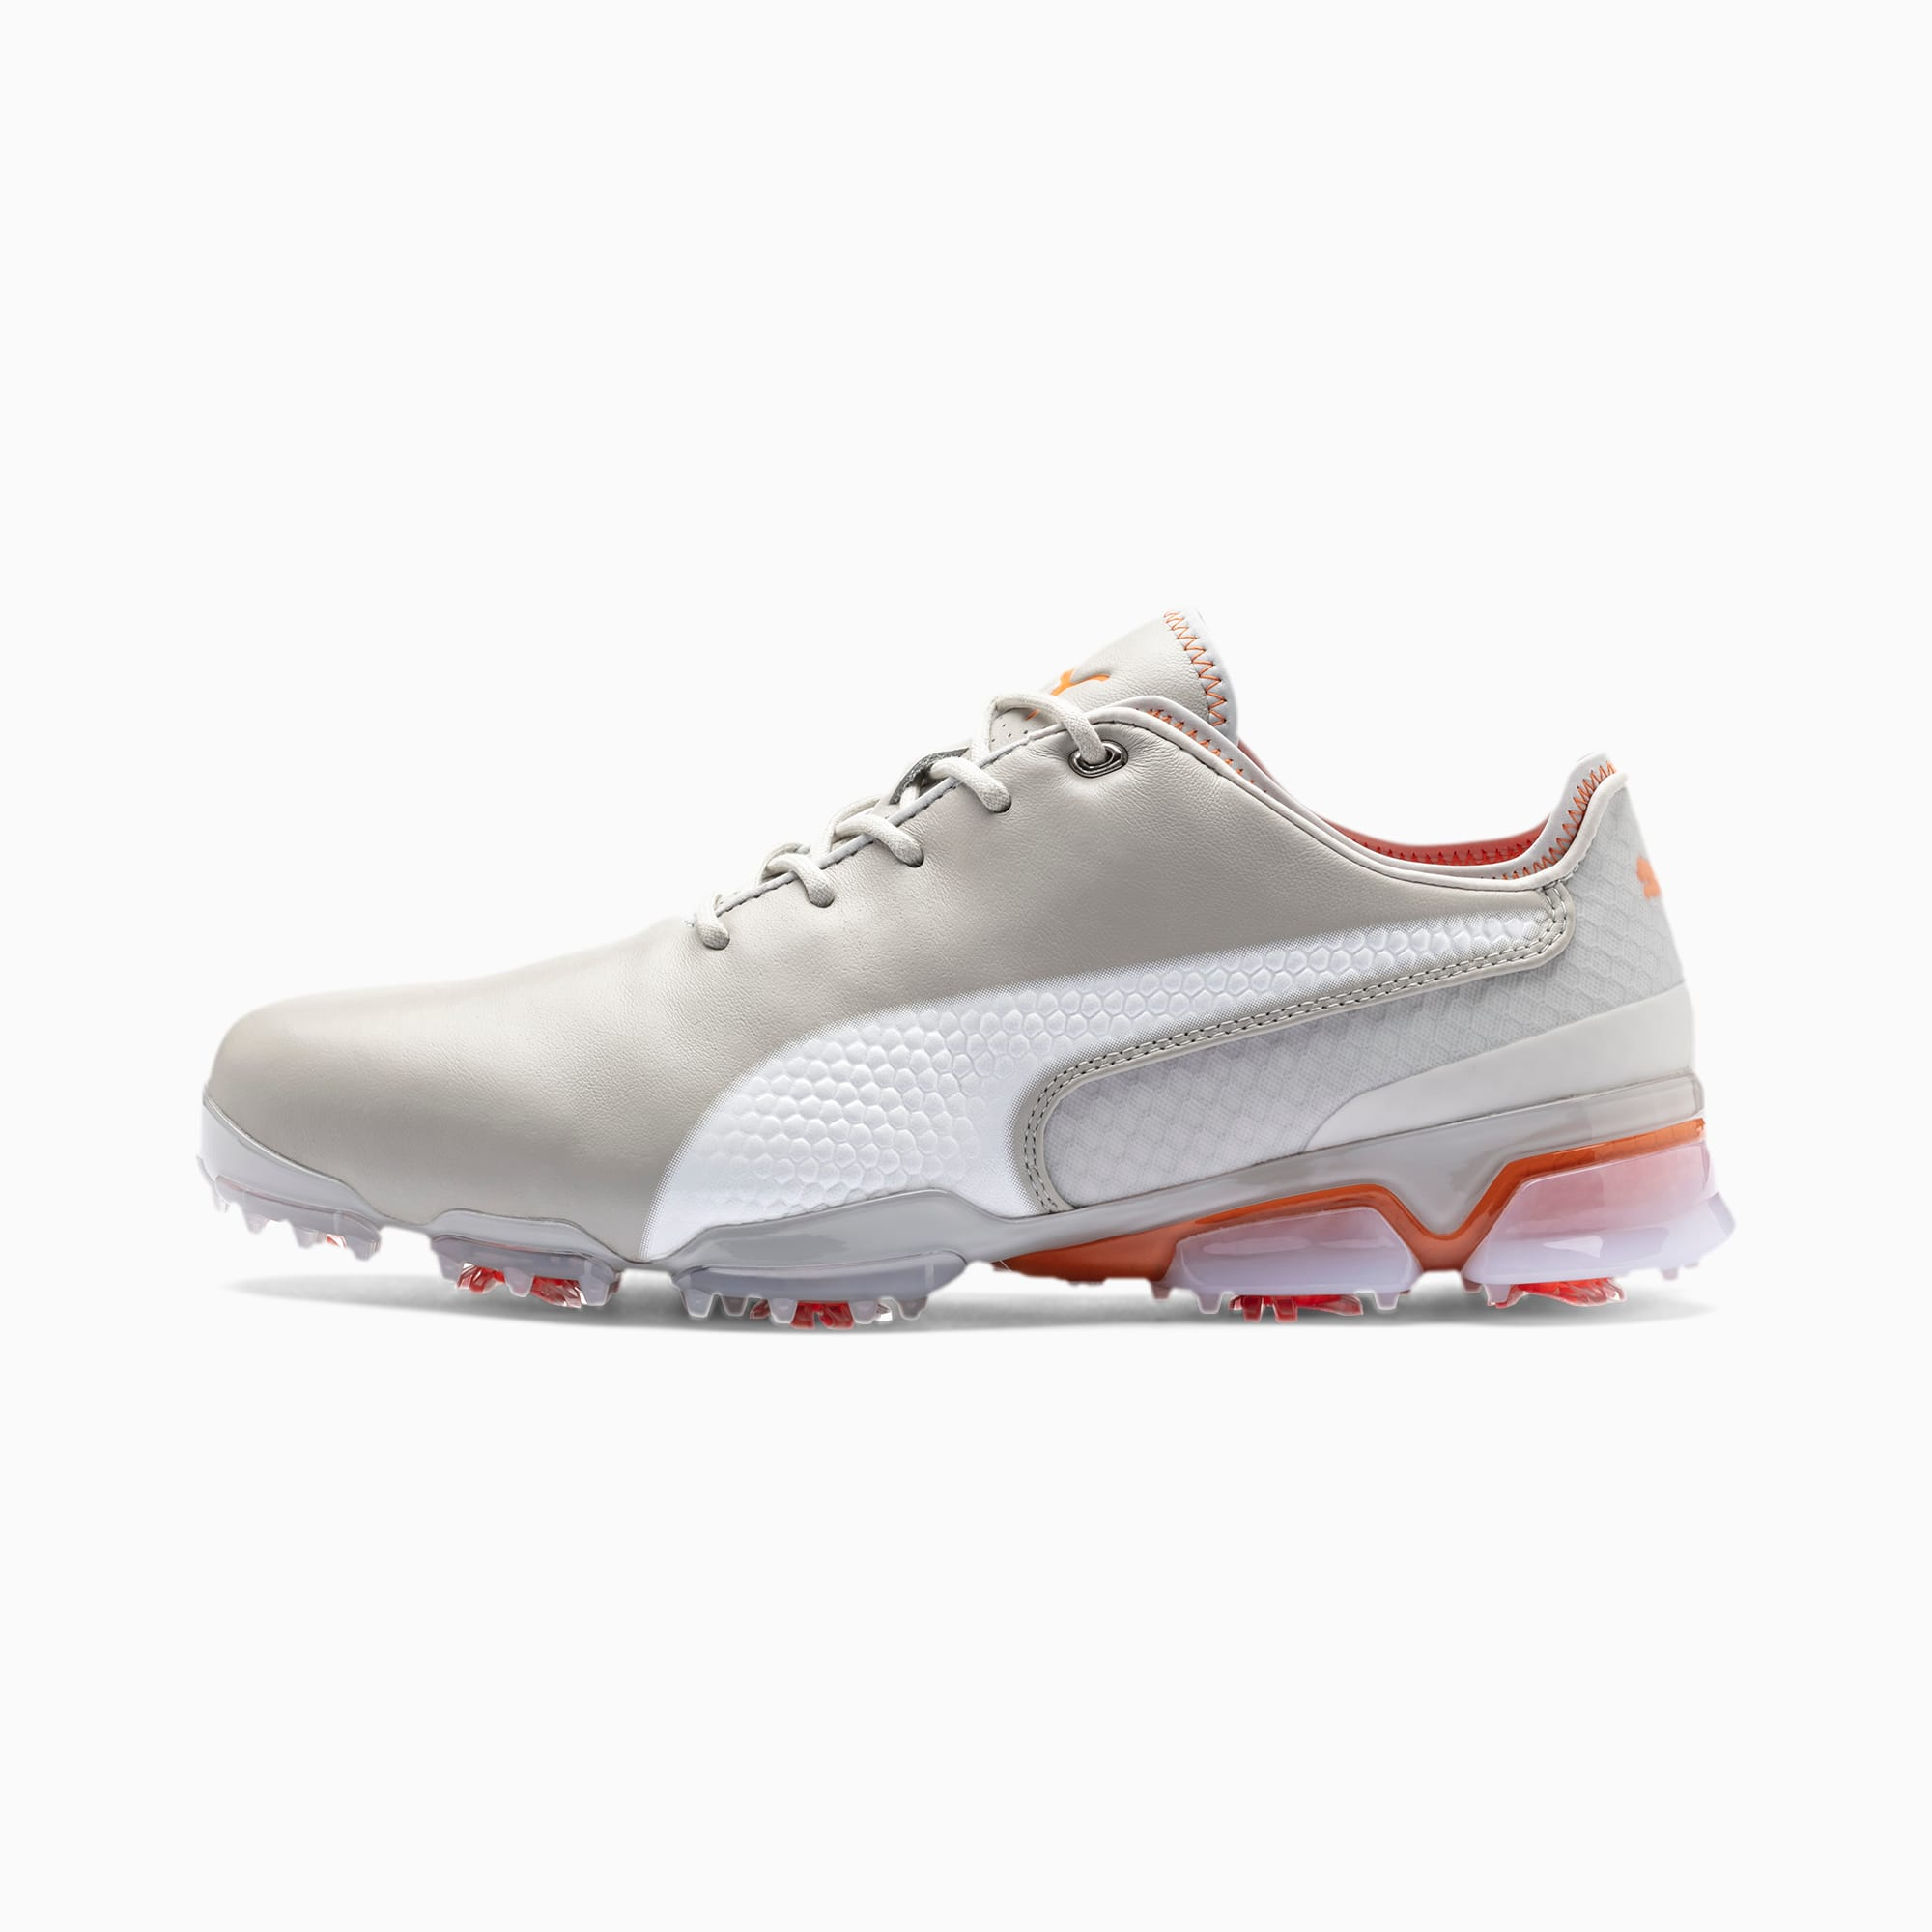 scarpe golf puma uomo